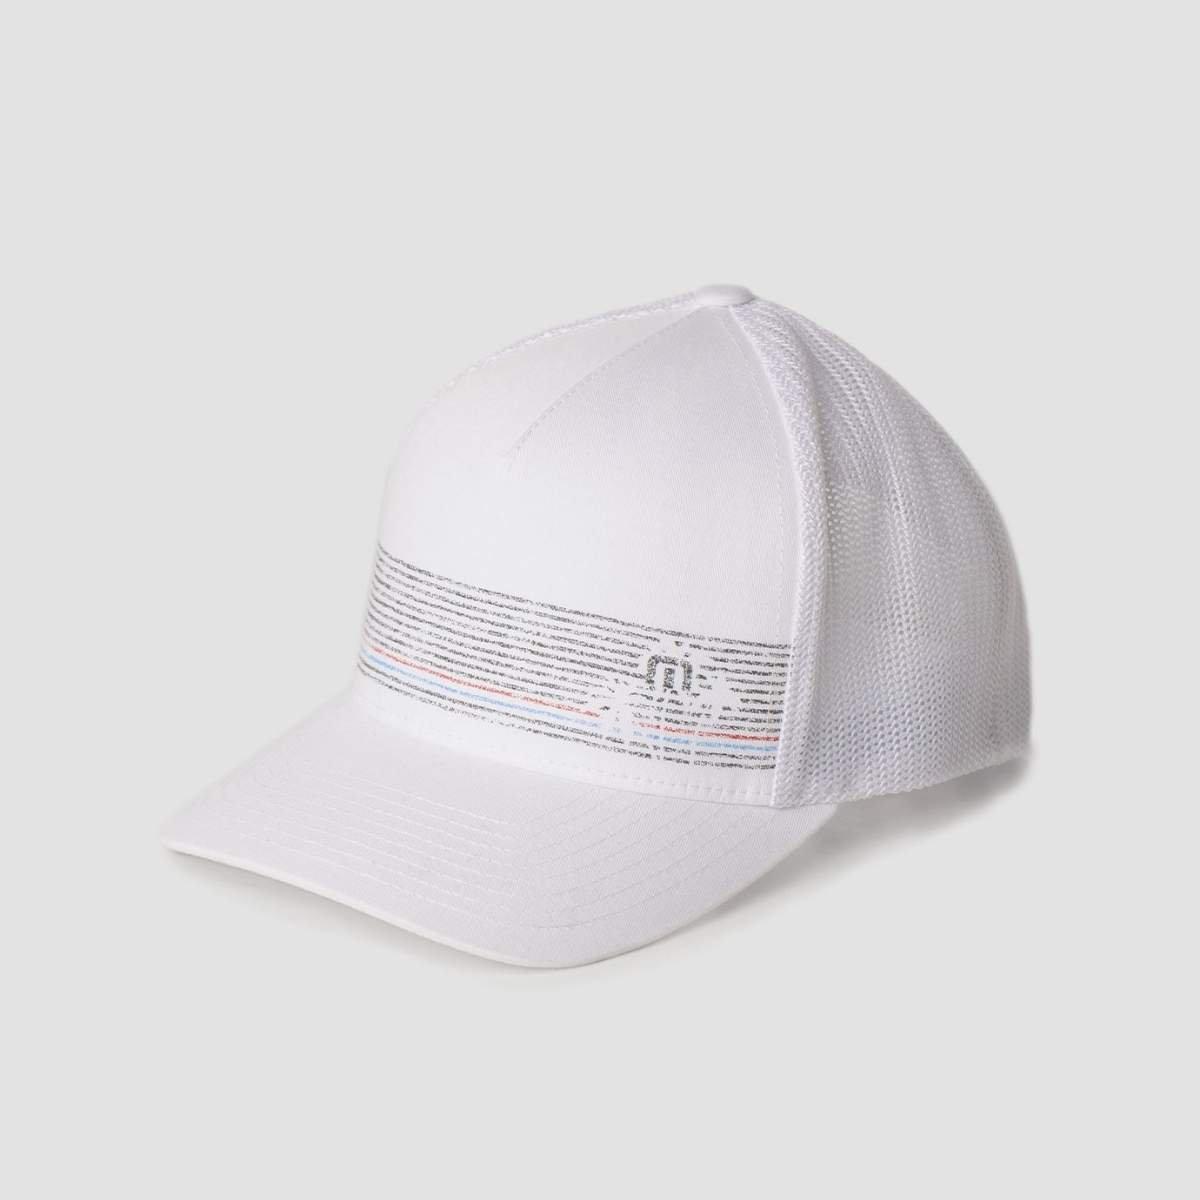 Travismathew Tanlines Snapback Hat